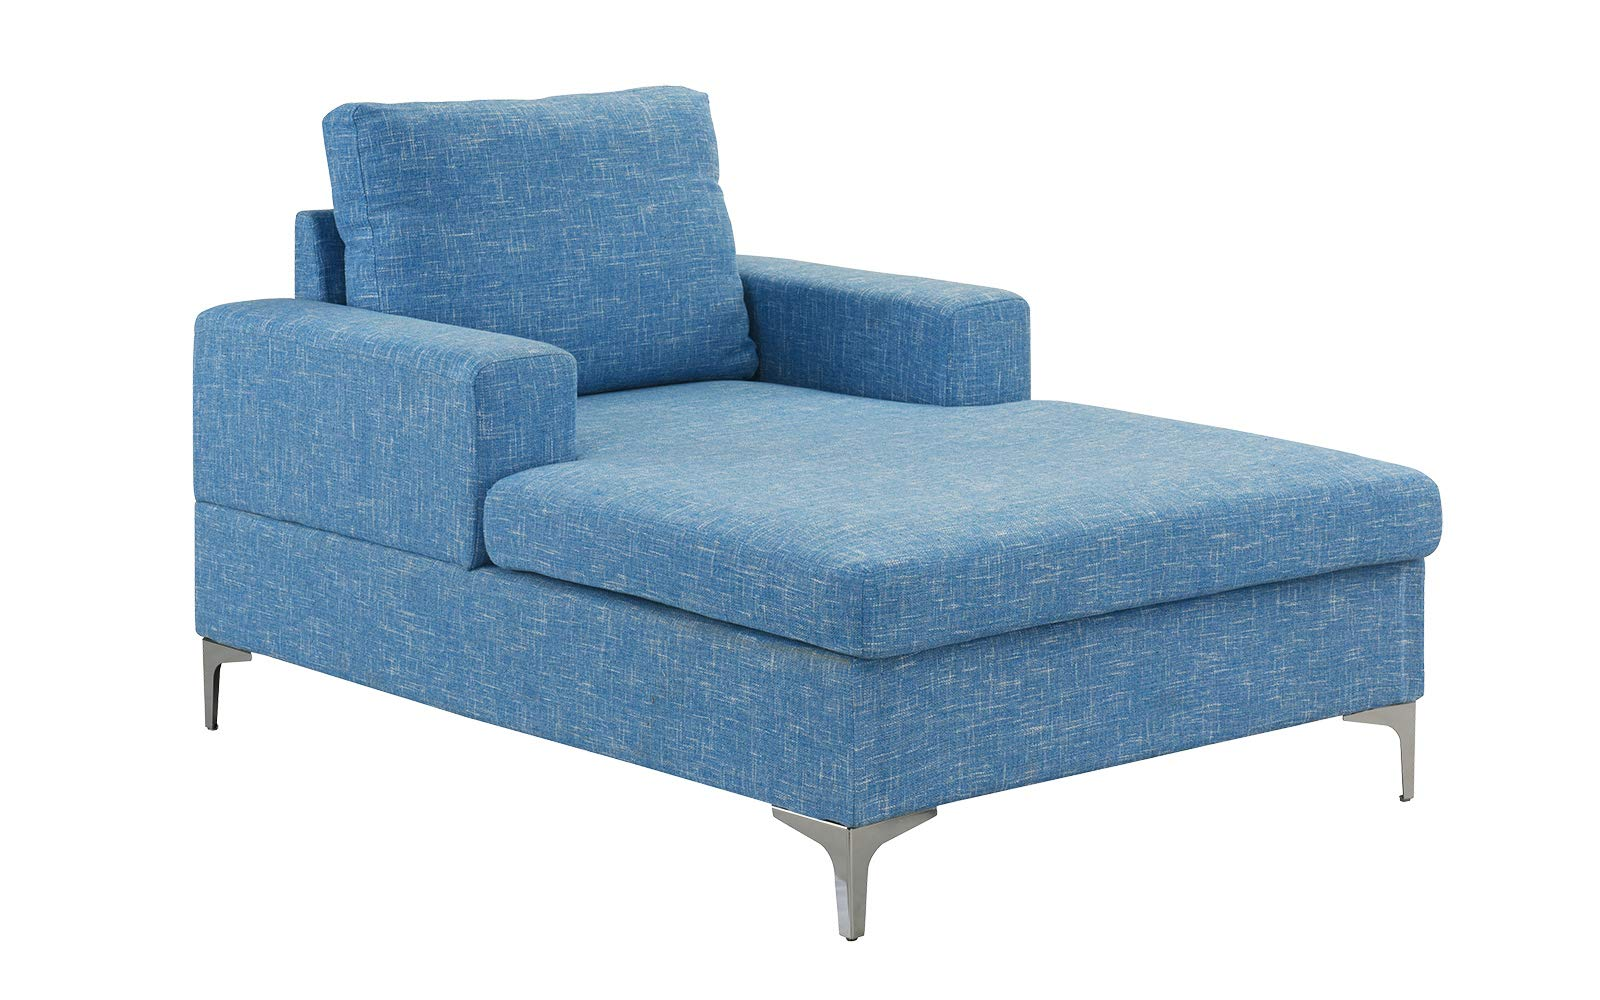 Casa Andrea Milano Modern Chaise Lounge, Mid Century Linen Fabric Chaise (Light Blue) by Casa Andrea Milano